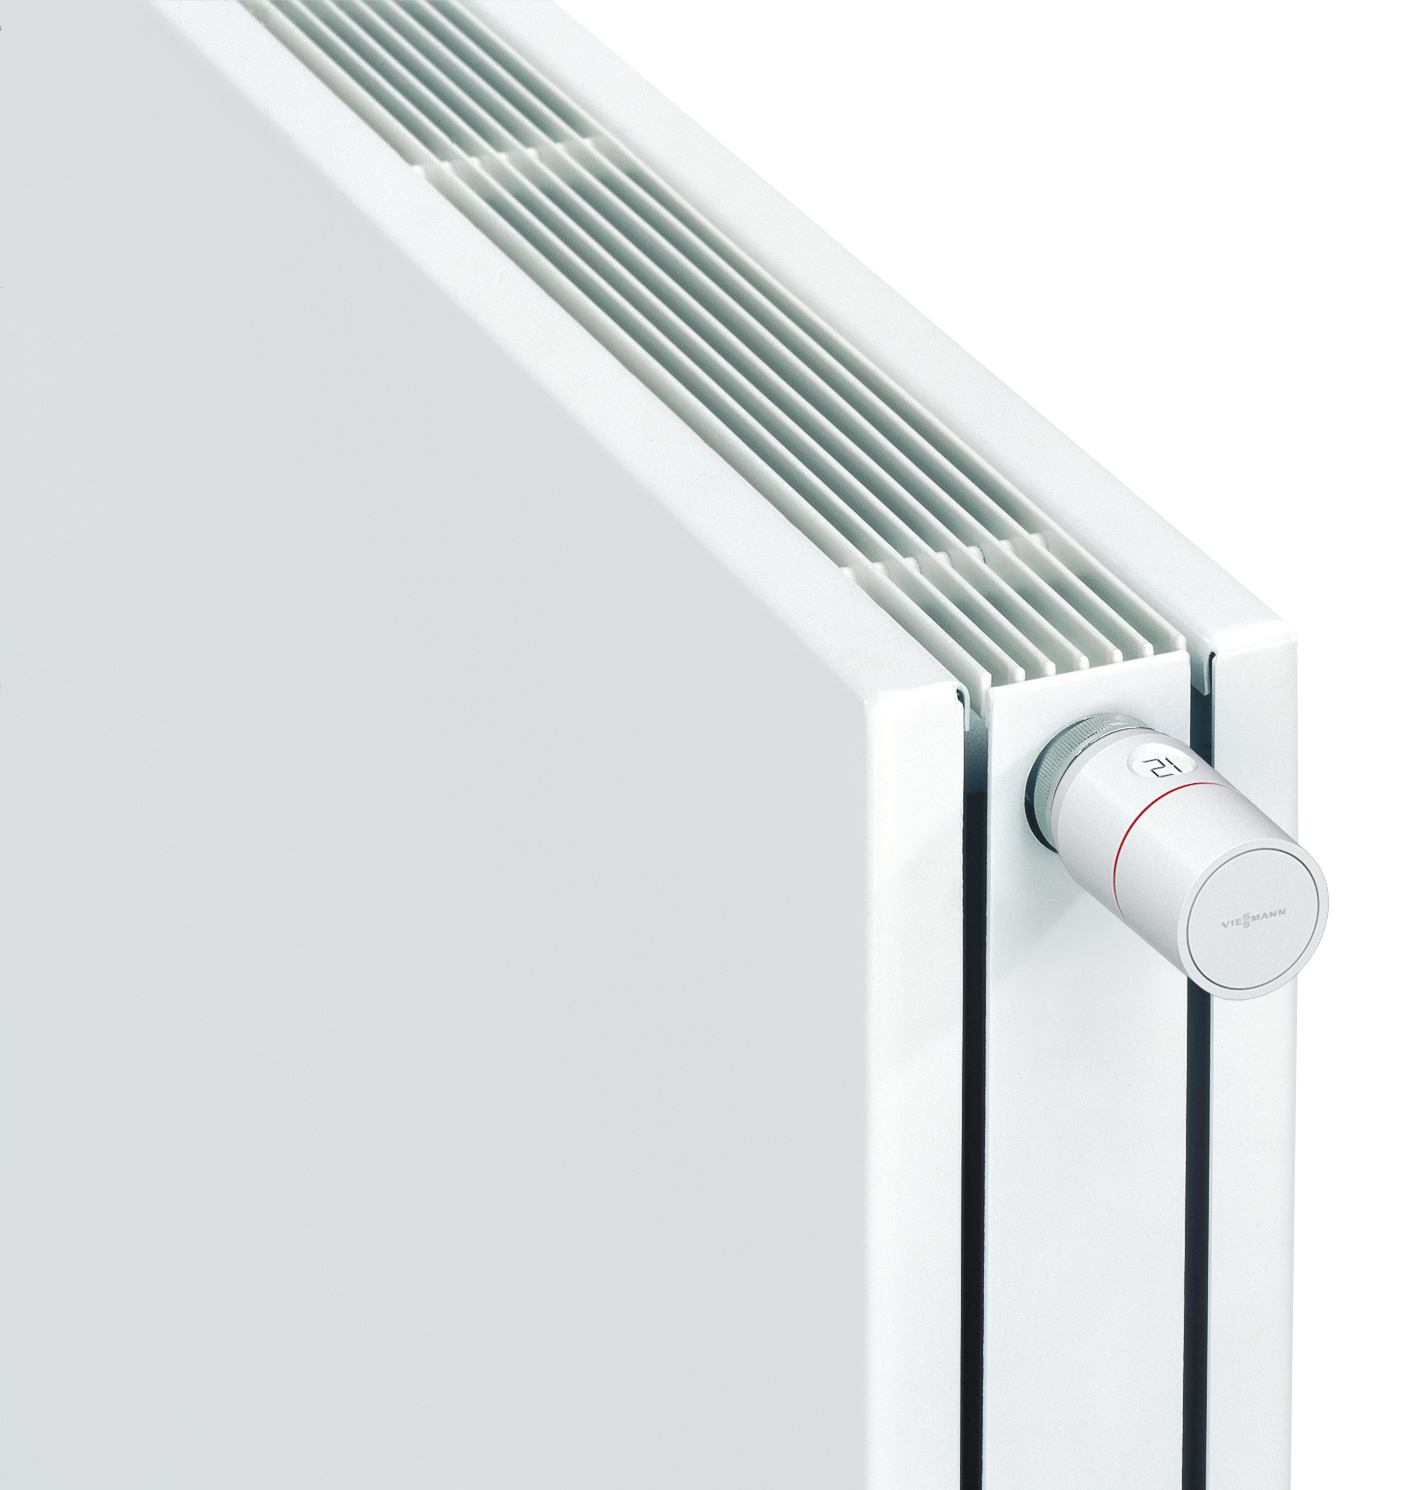 ViCare-Heizkorper-Thermostat_00030